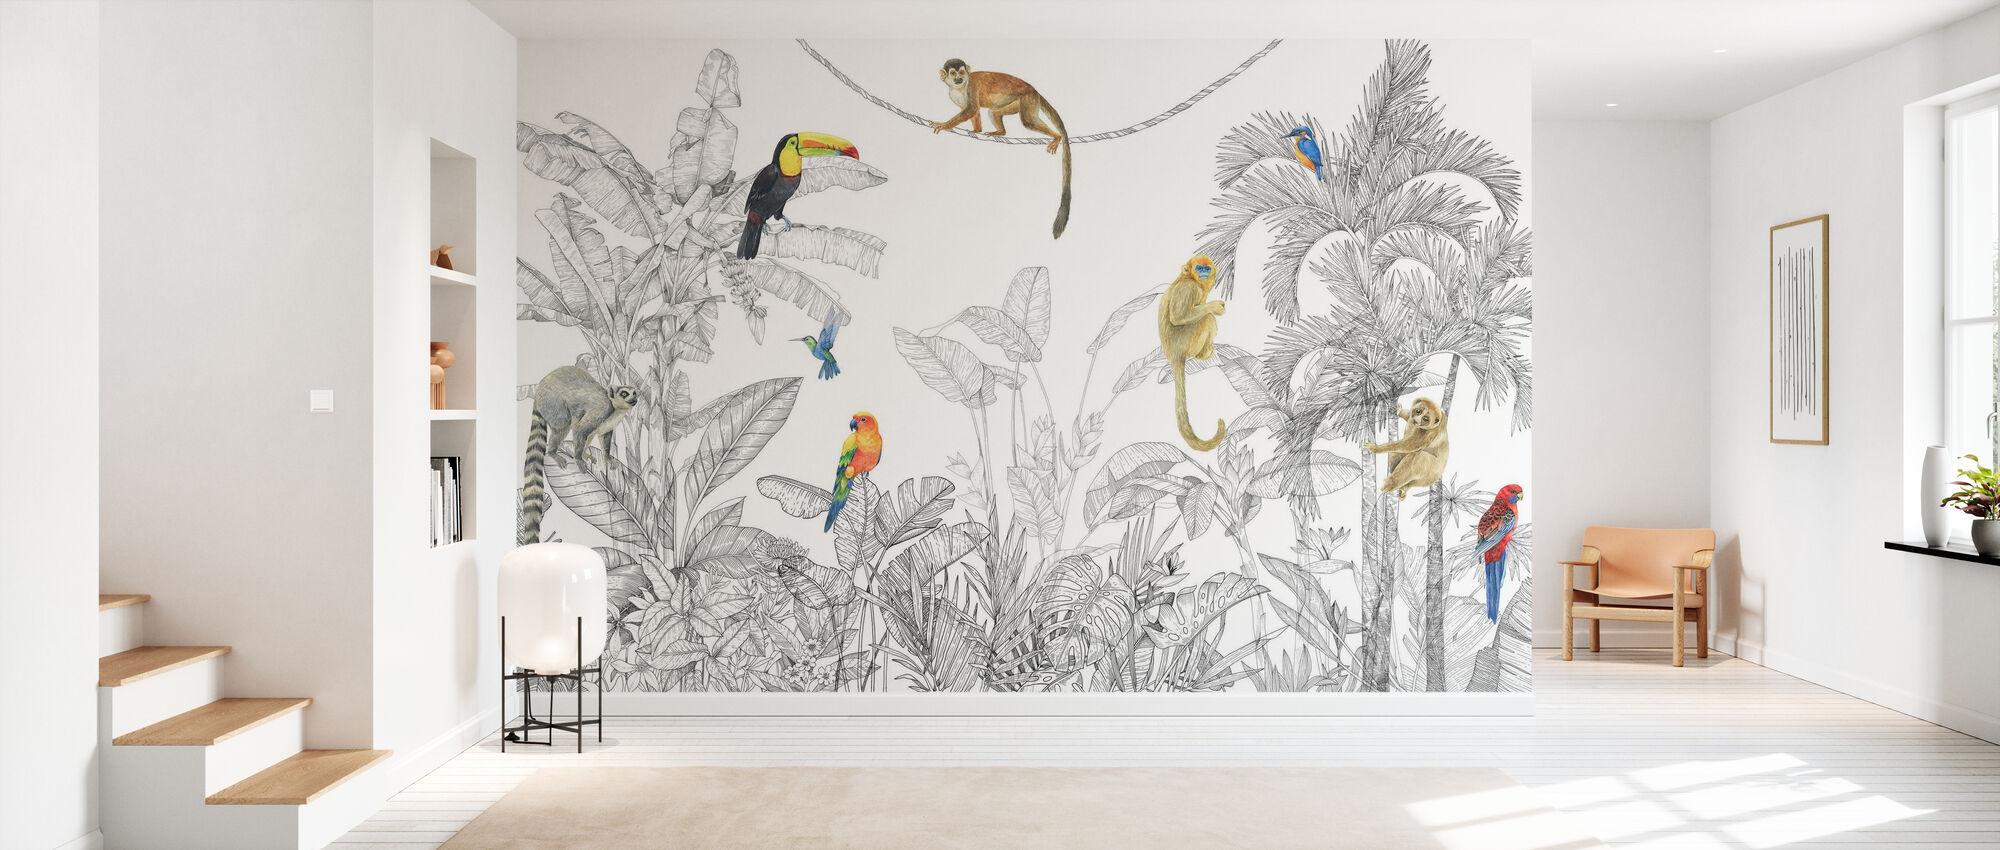 In Harmony - Line Art - Wallpaper - Hallway